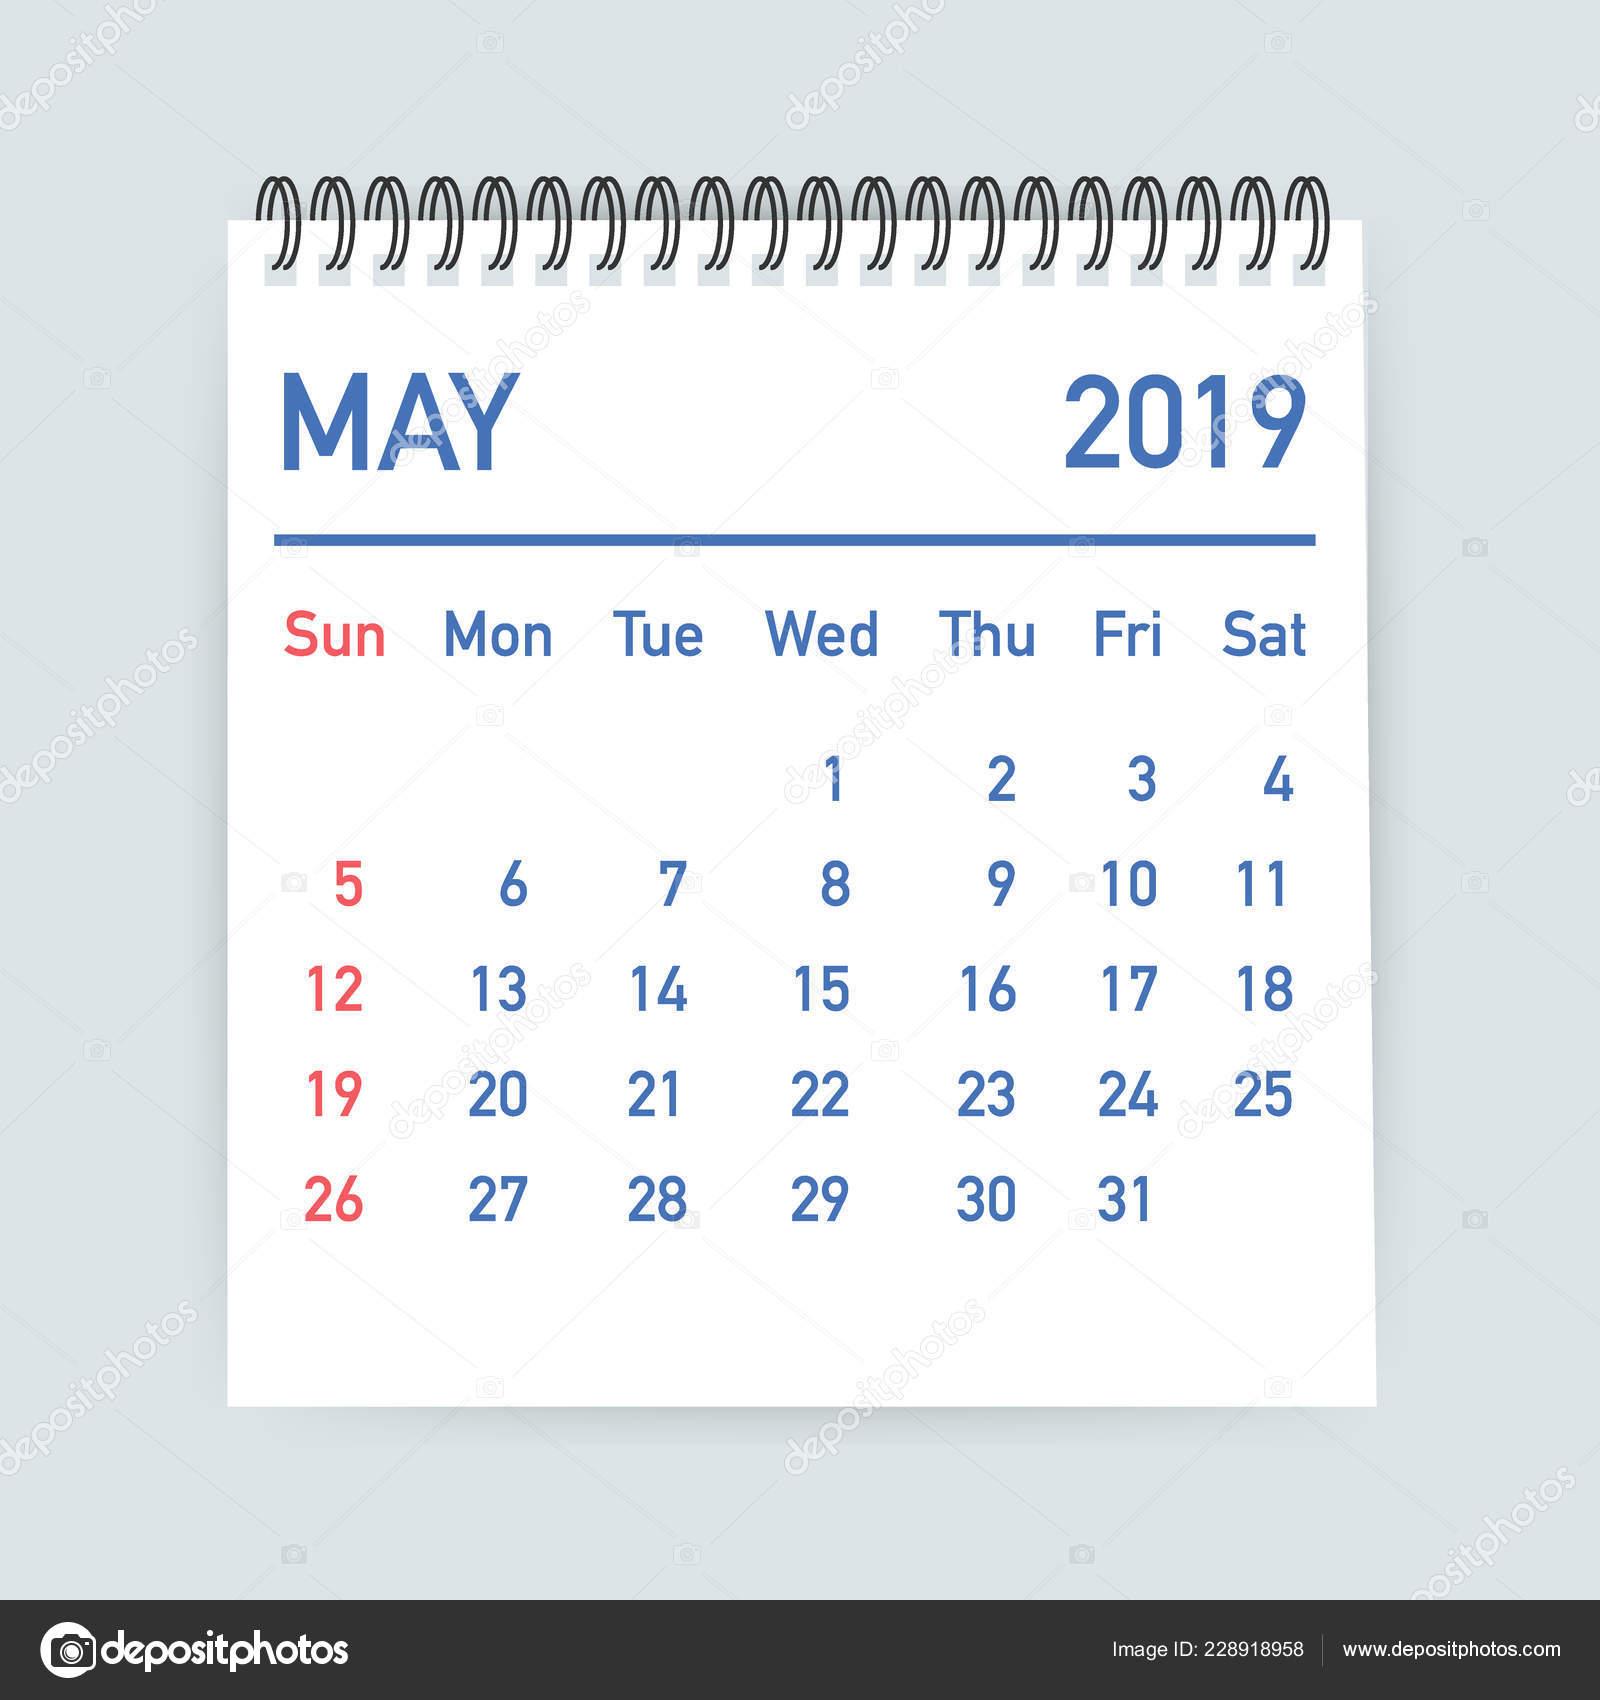 Mai Calendrier 2019.Feuille De Calendrier Mai 2019 Calendrier 2019 Dans Le